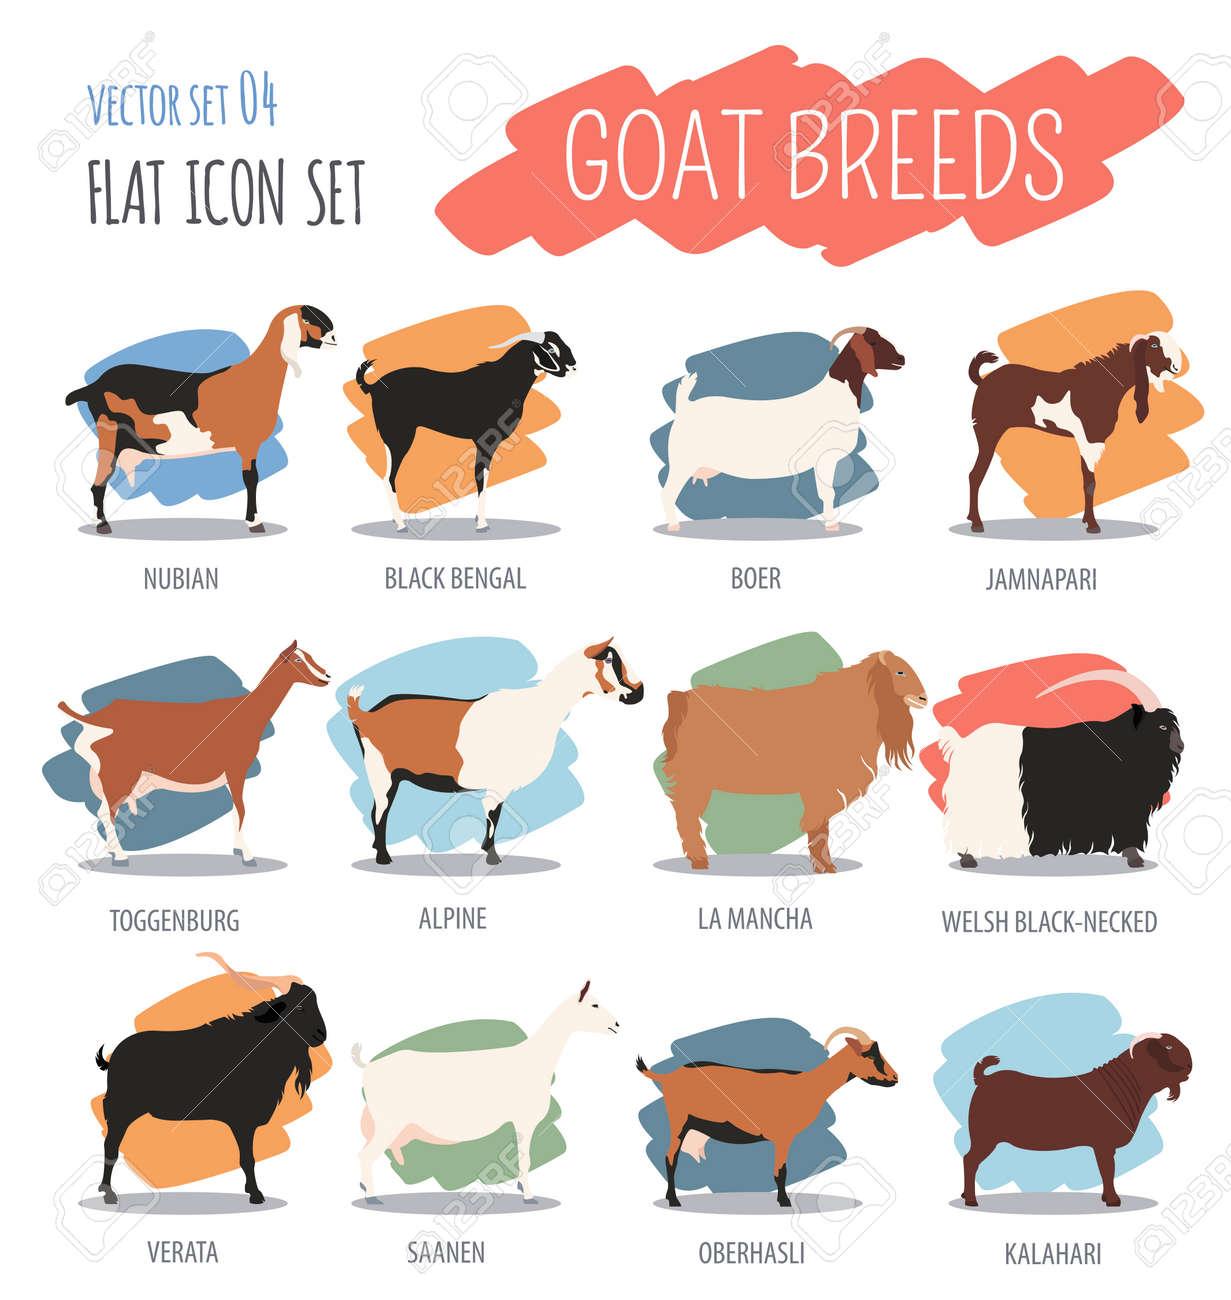 Goat breeds icon set  Animal farming  Flat design  Vector illustration